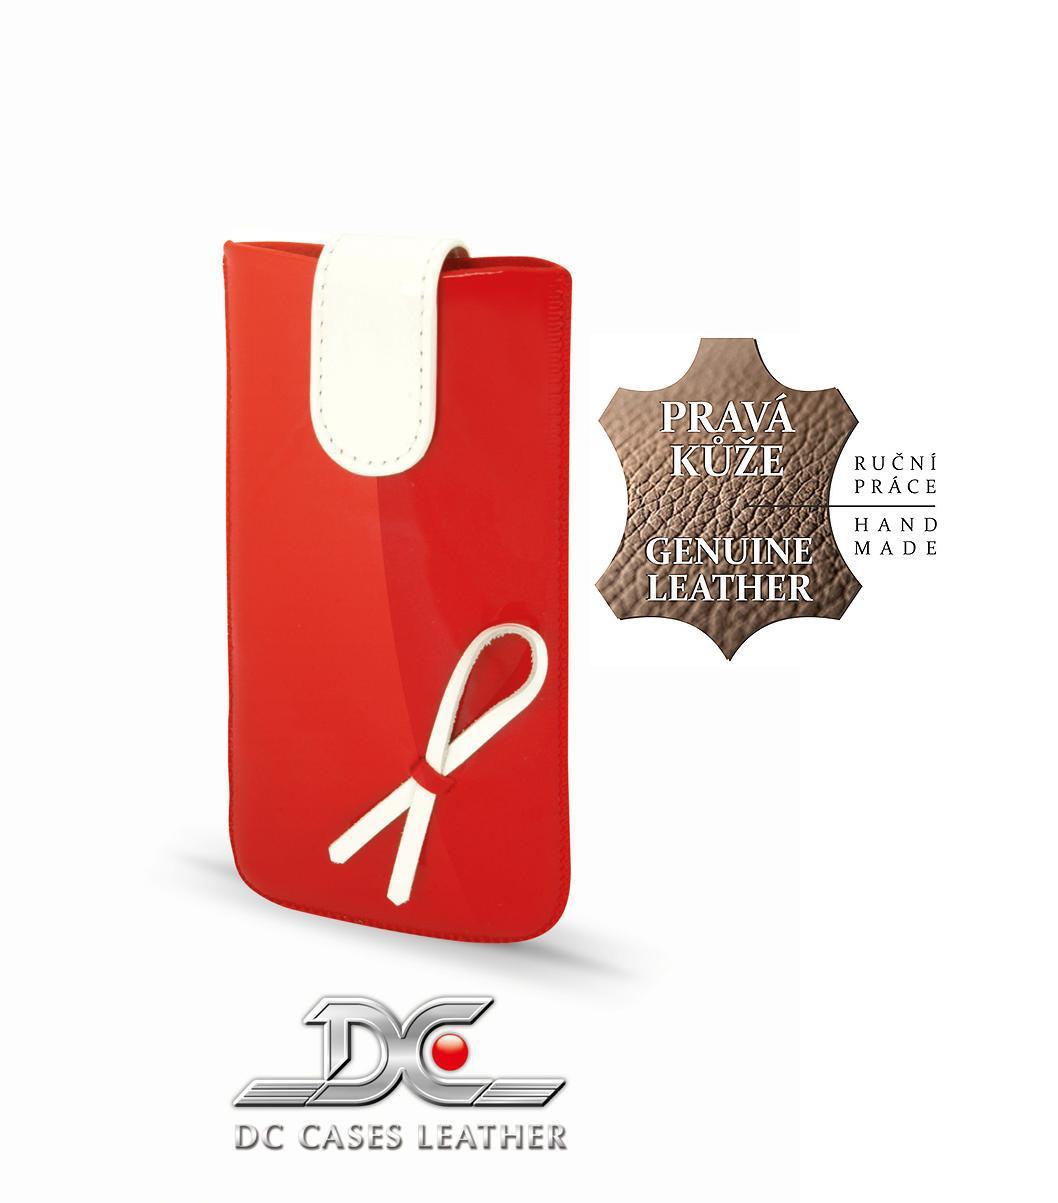 DC (TOP) POUZDRO L+ Protect (M) S MAŠLIČKOU Lesklé ČEVENÉ (iPhone 5S)